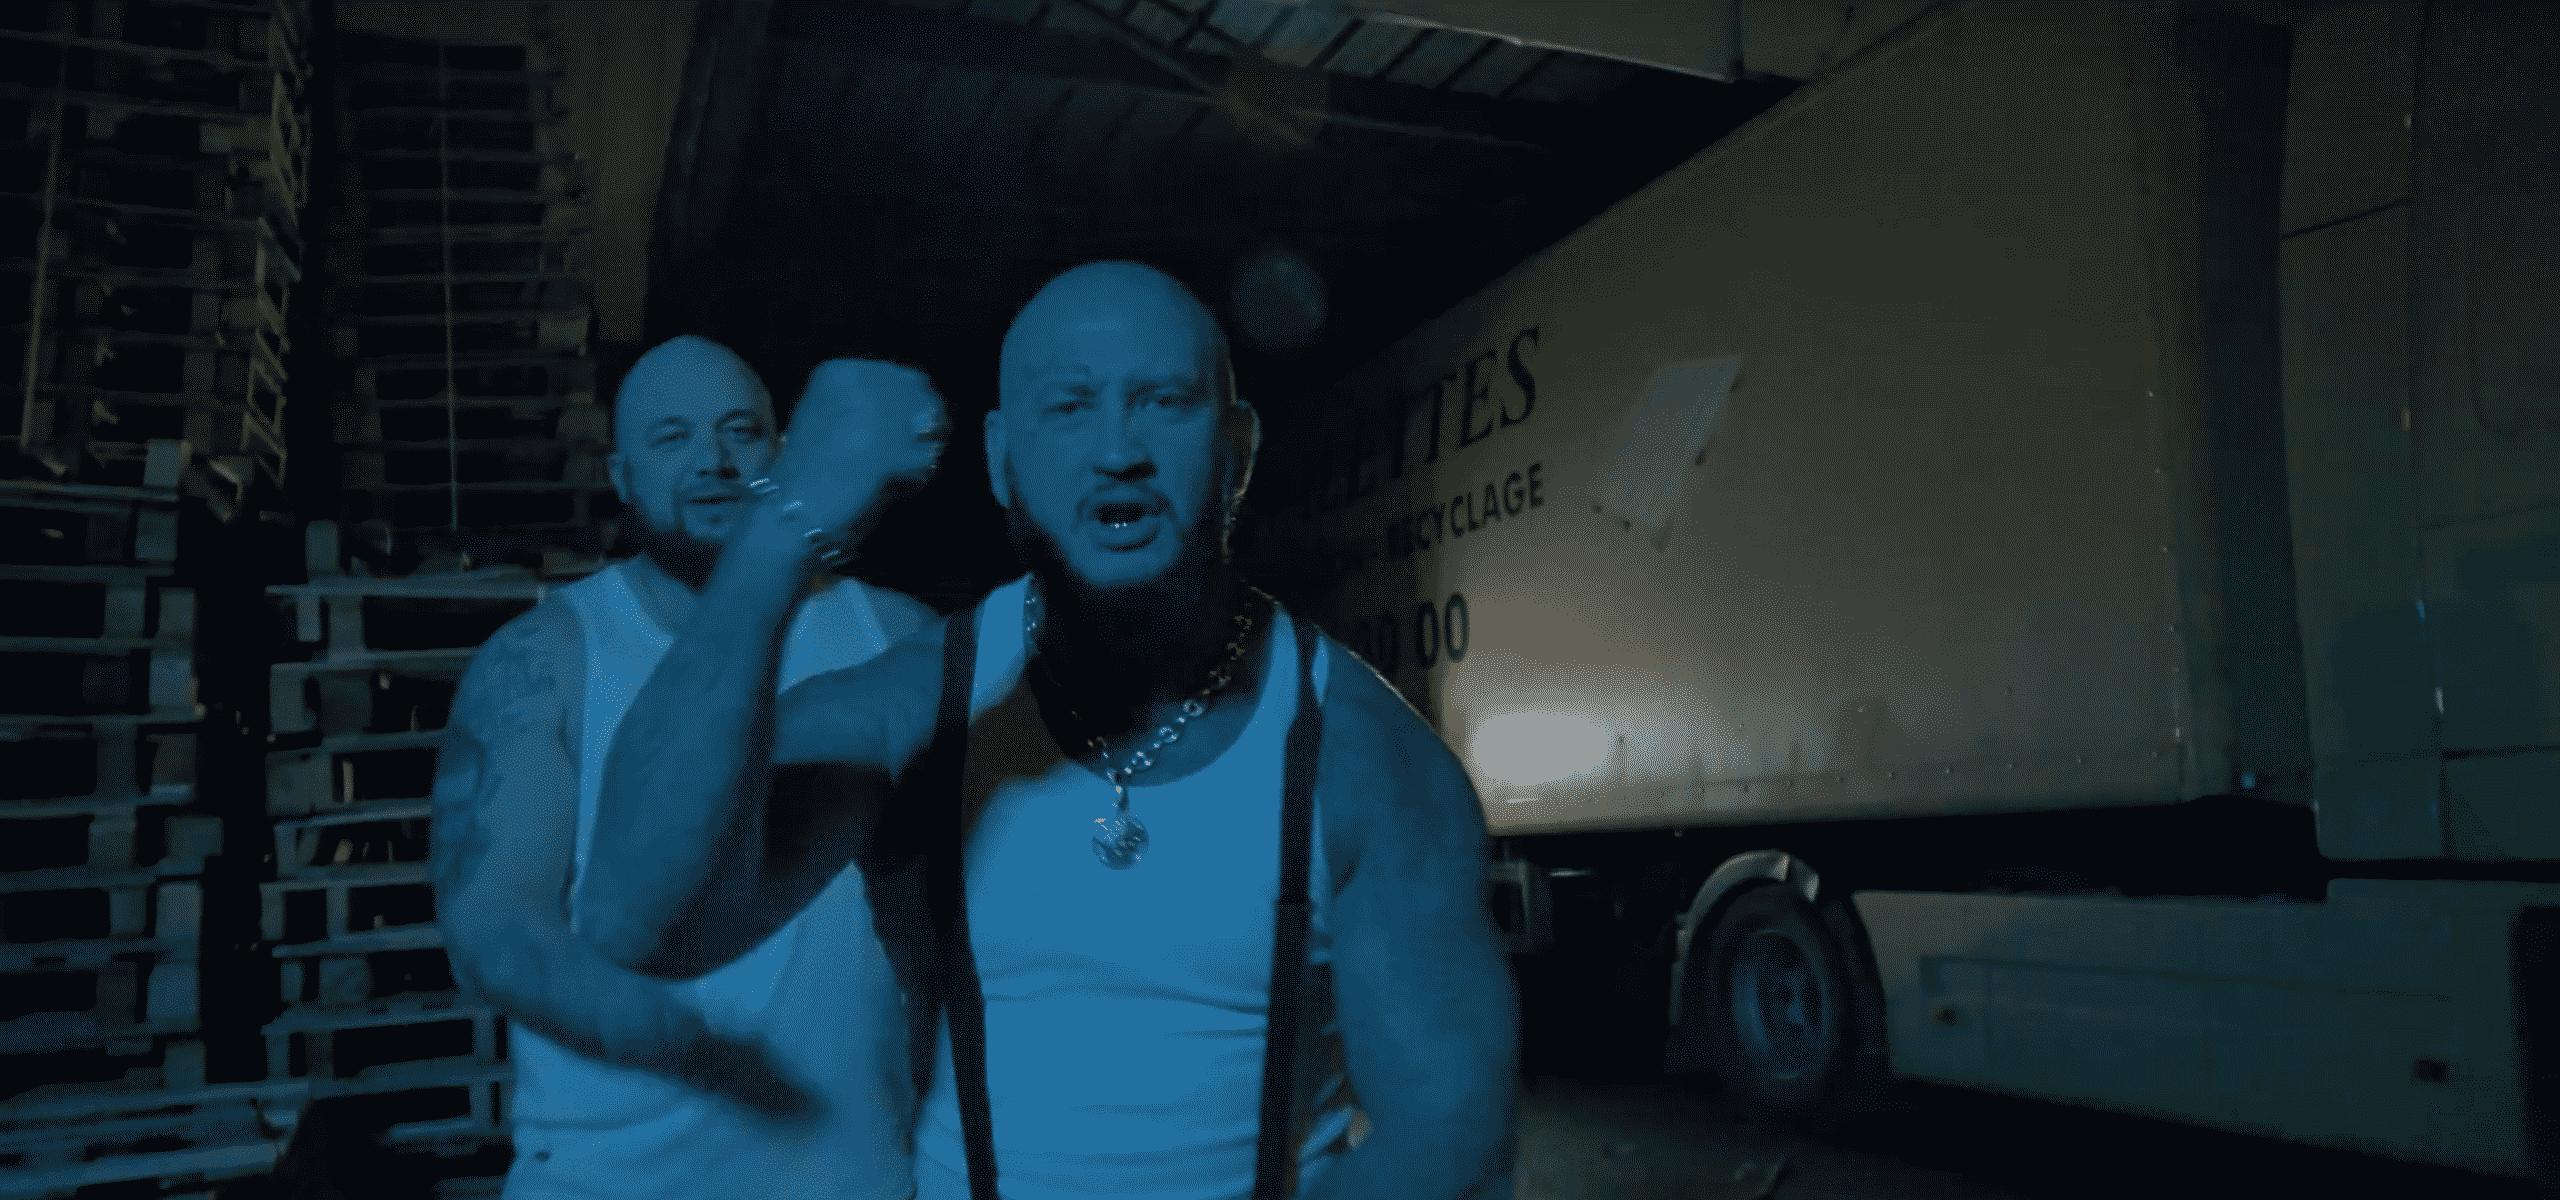 image seth gueko clip camionneurs